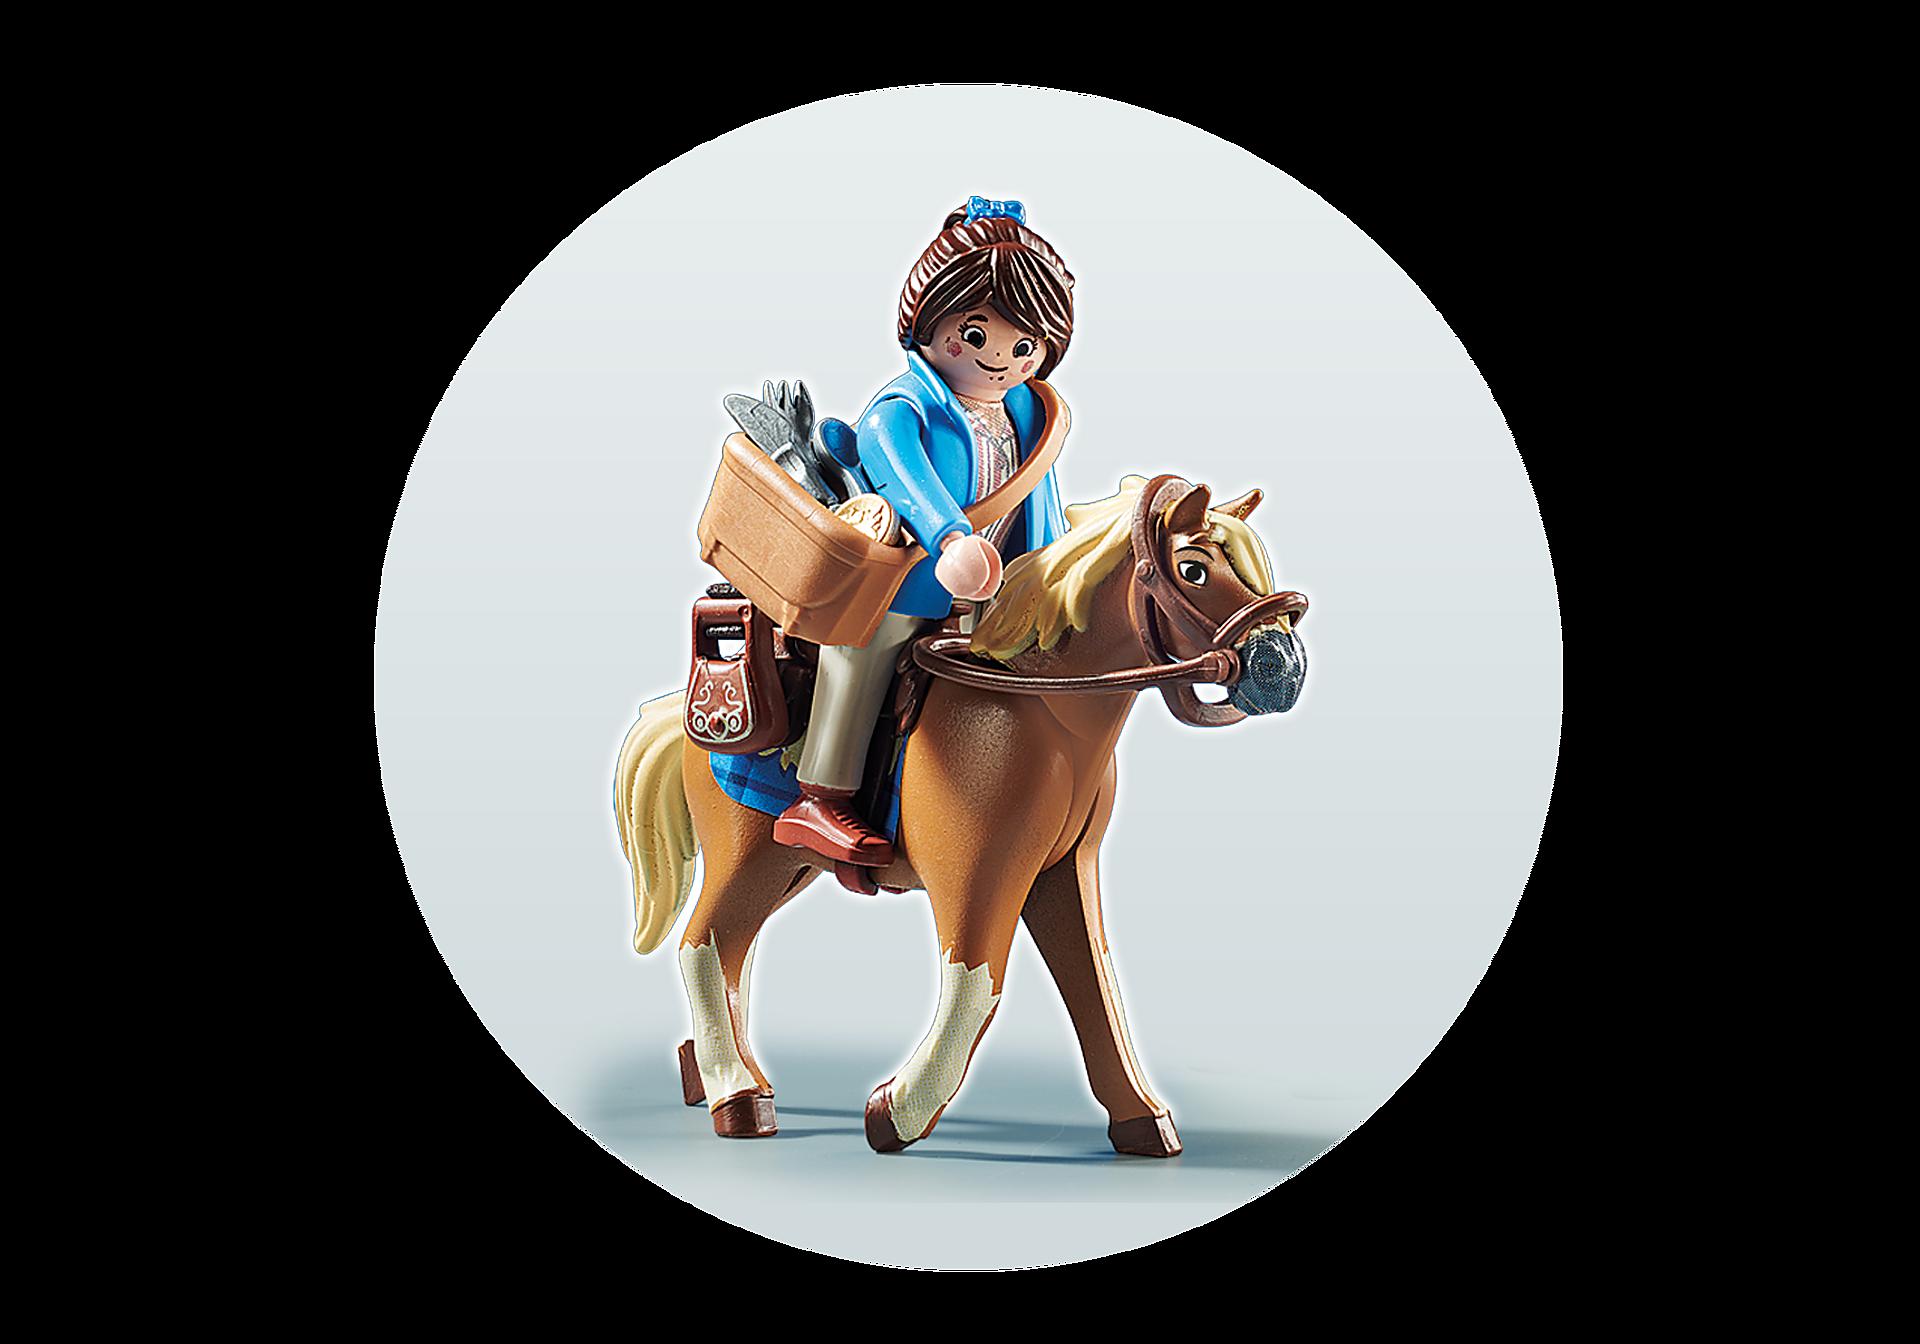 70072 PLAYMOBIL:THE MOVIE Marla mit Pferd zoom image4